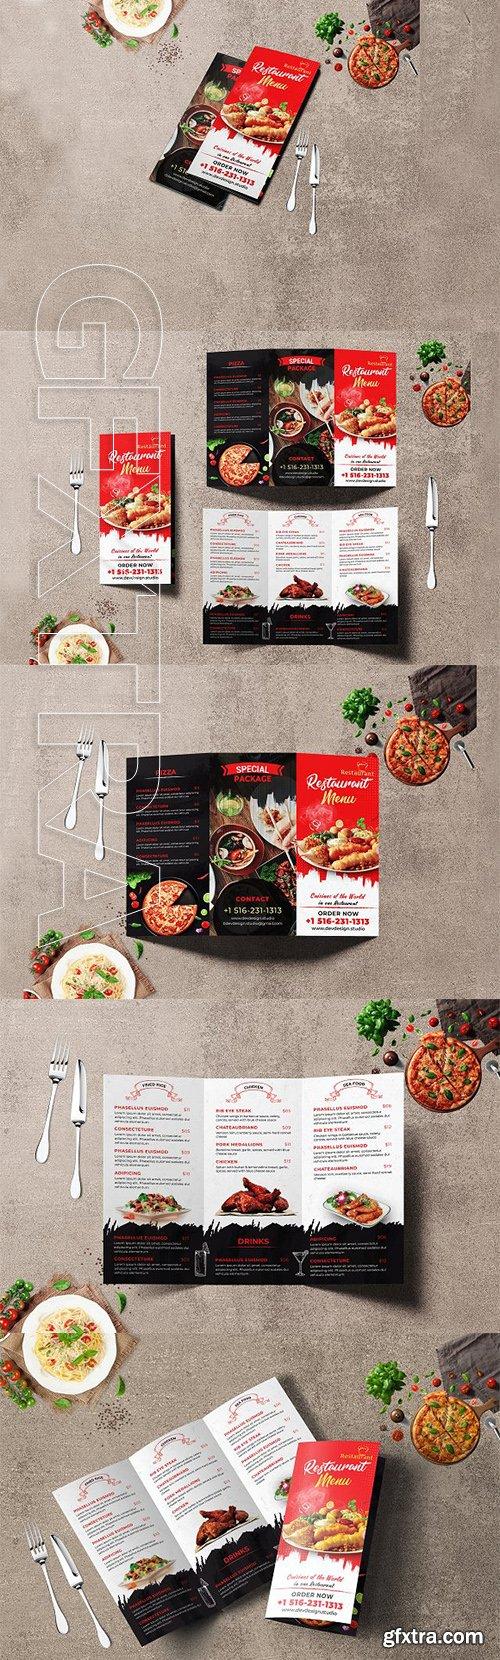 CreativeMarket - Modern Restaurant Trifold Brochure 3330030